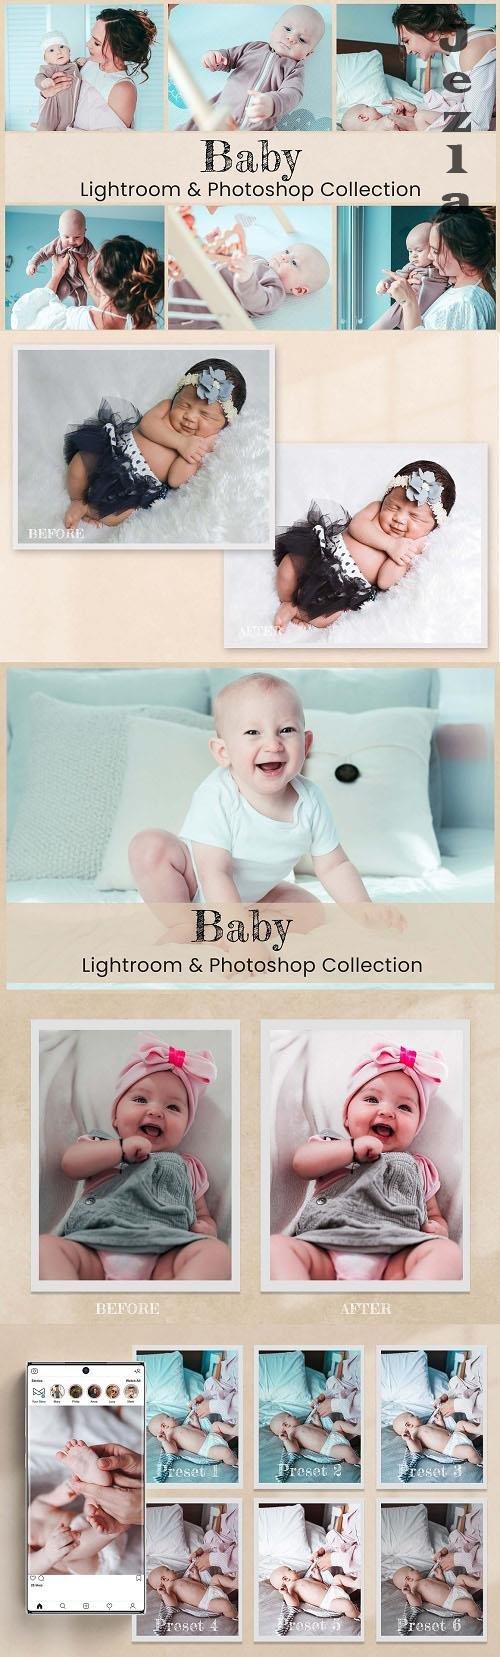 Baby LRM PHSP LUTs - 6520693